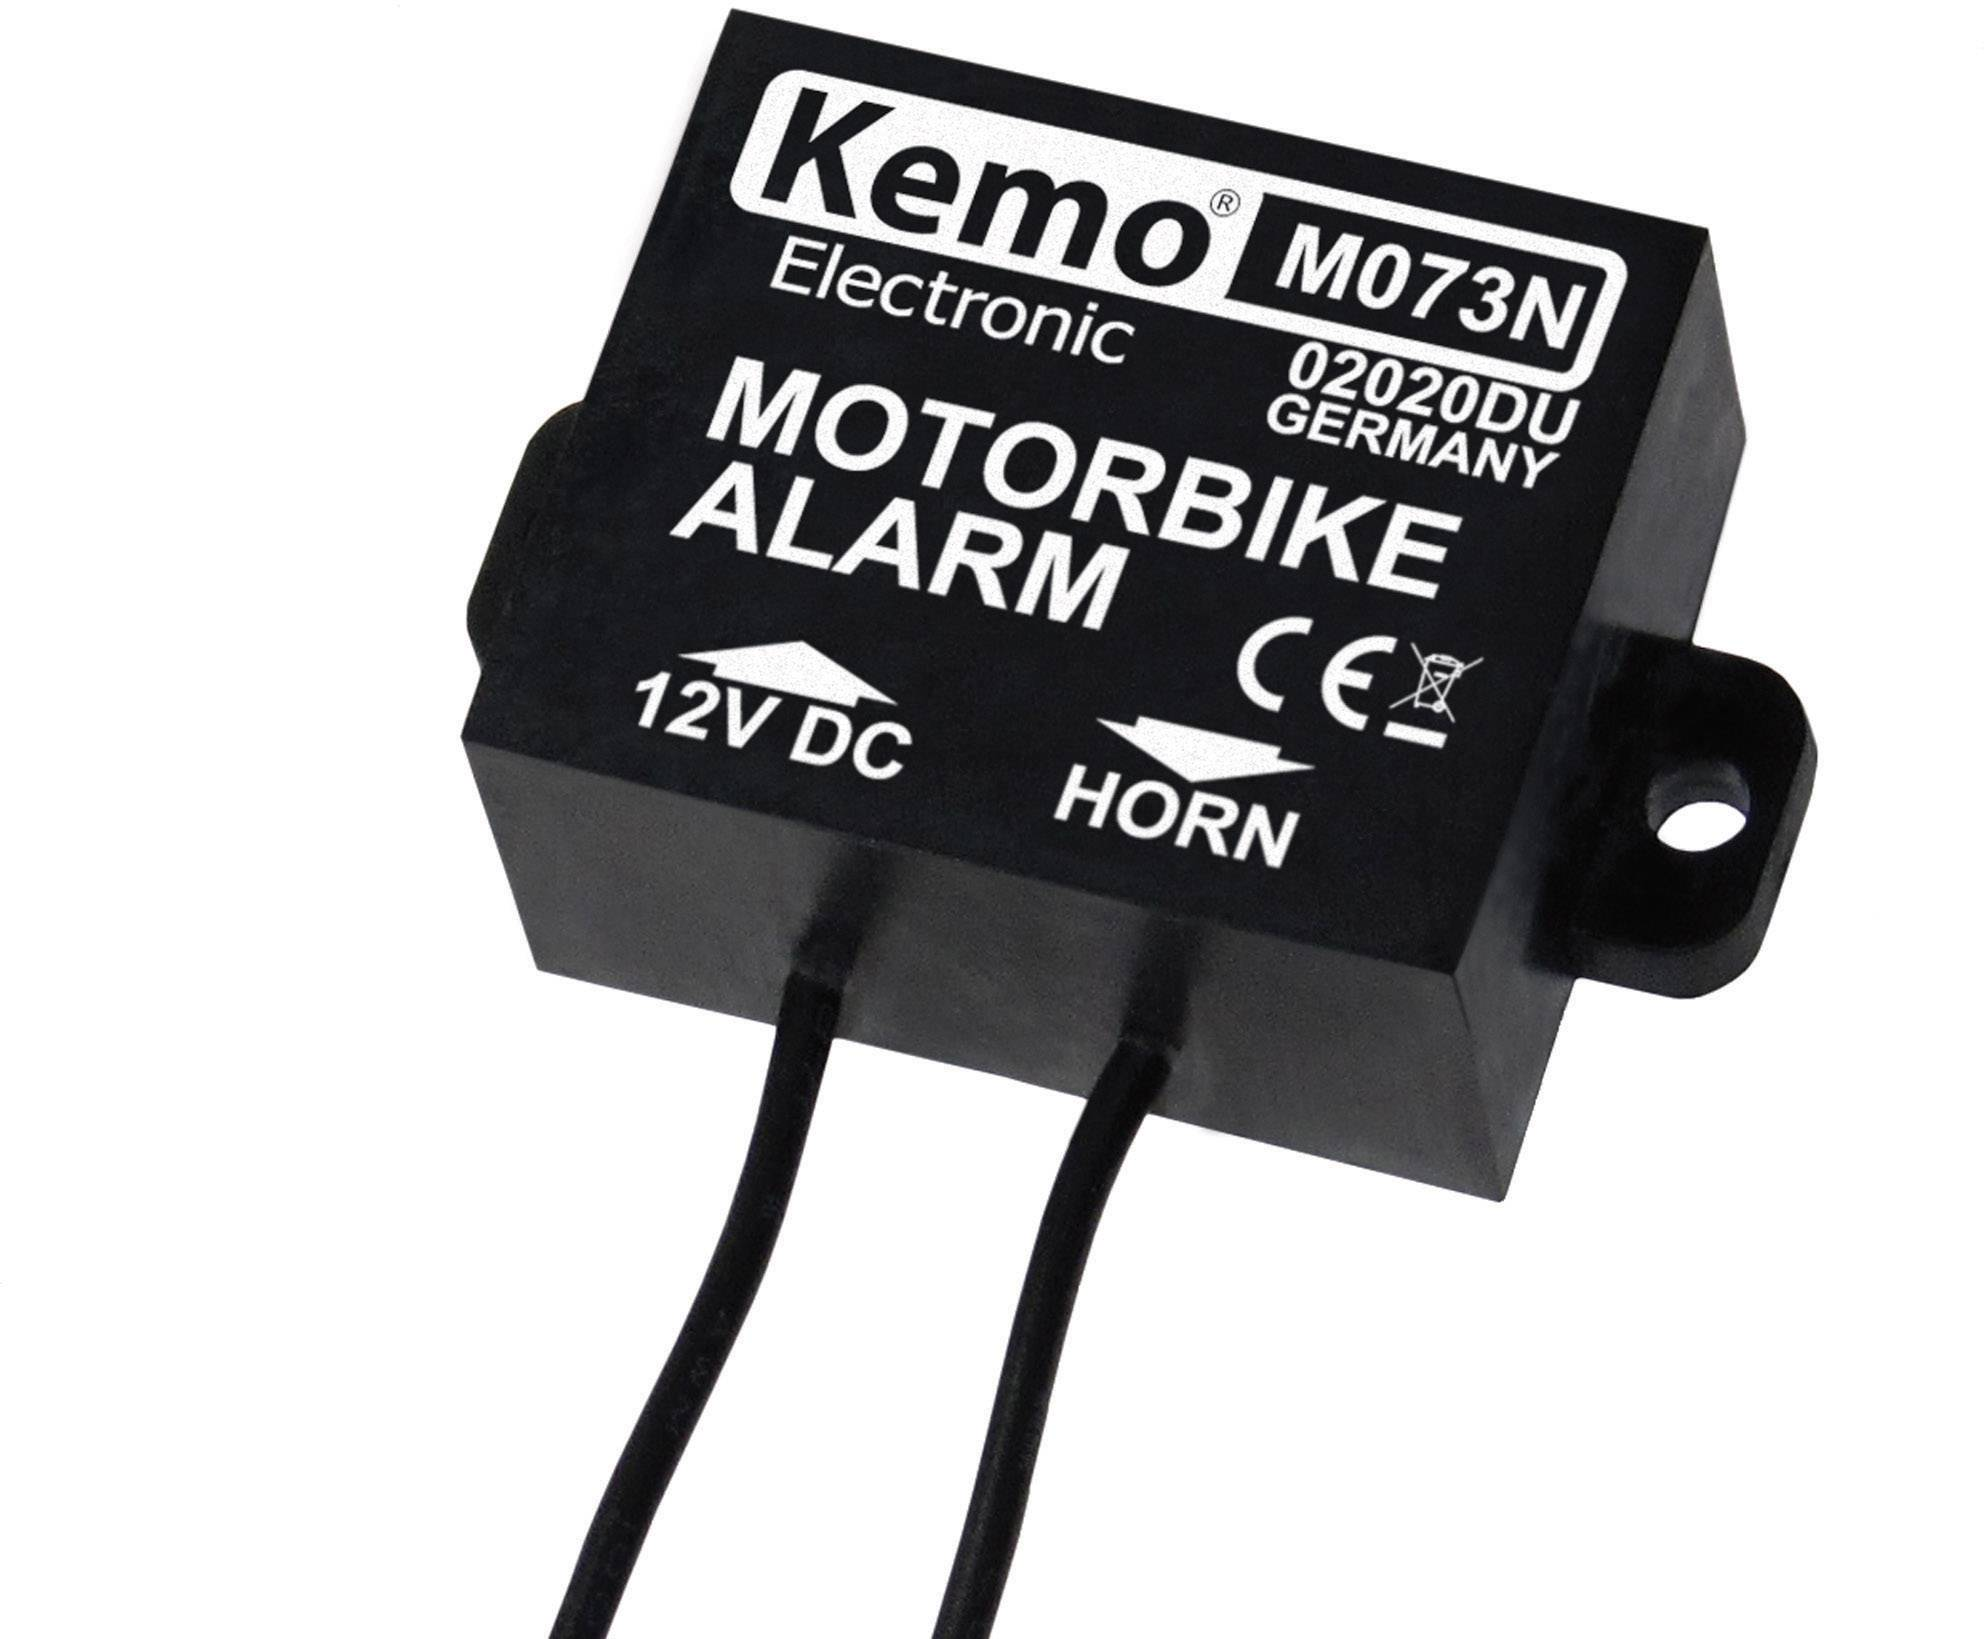 Alarm na bicykl Kemo M073N, 30 x 25 x 15 mm